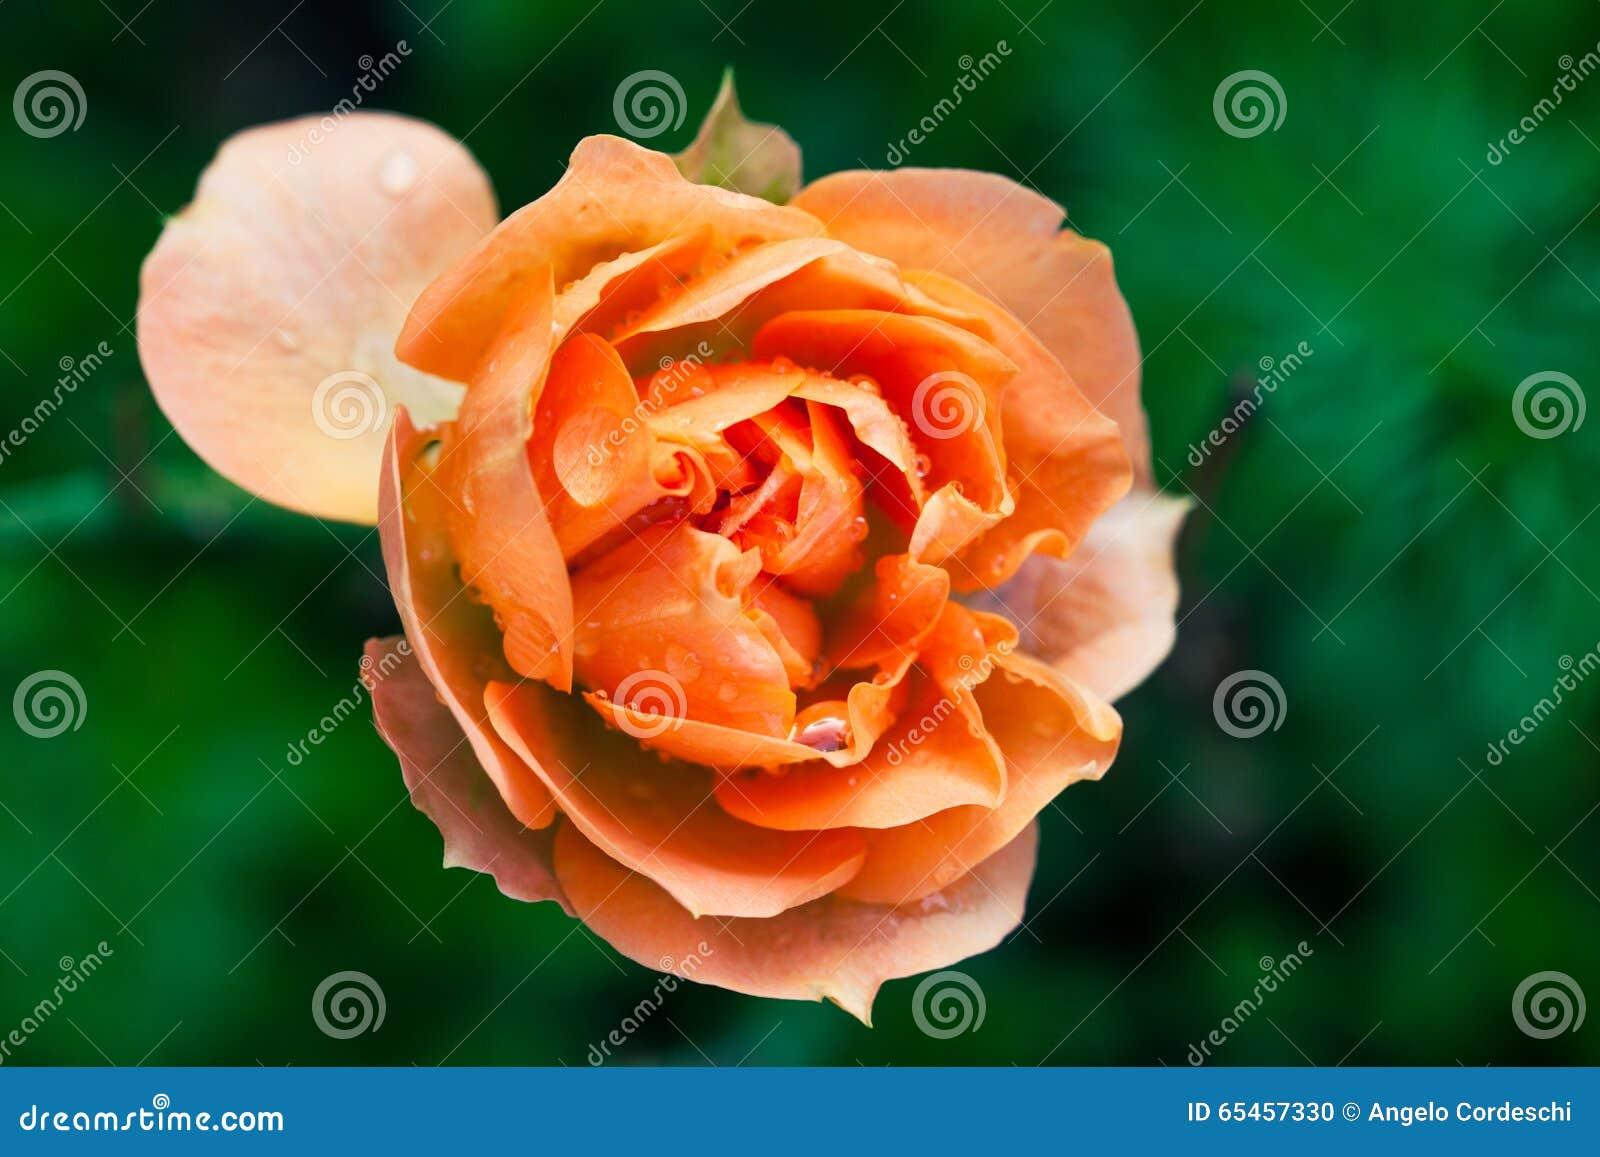 Wet rose flower macro photography. Orange pink colors